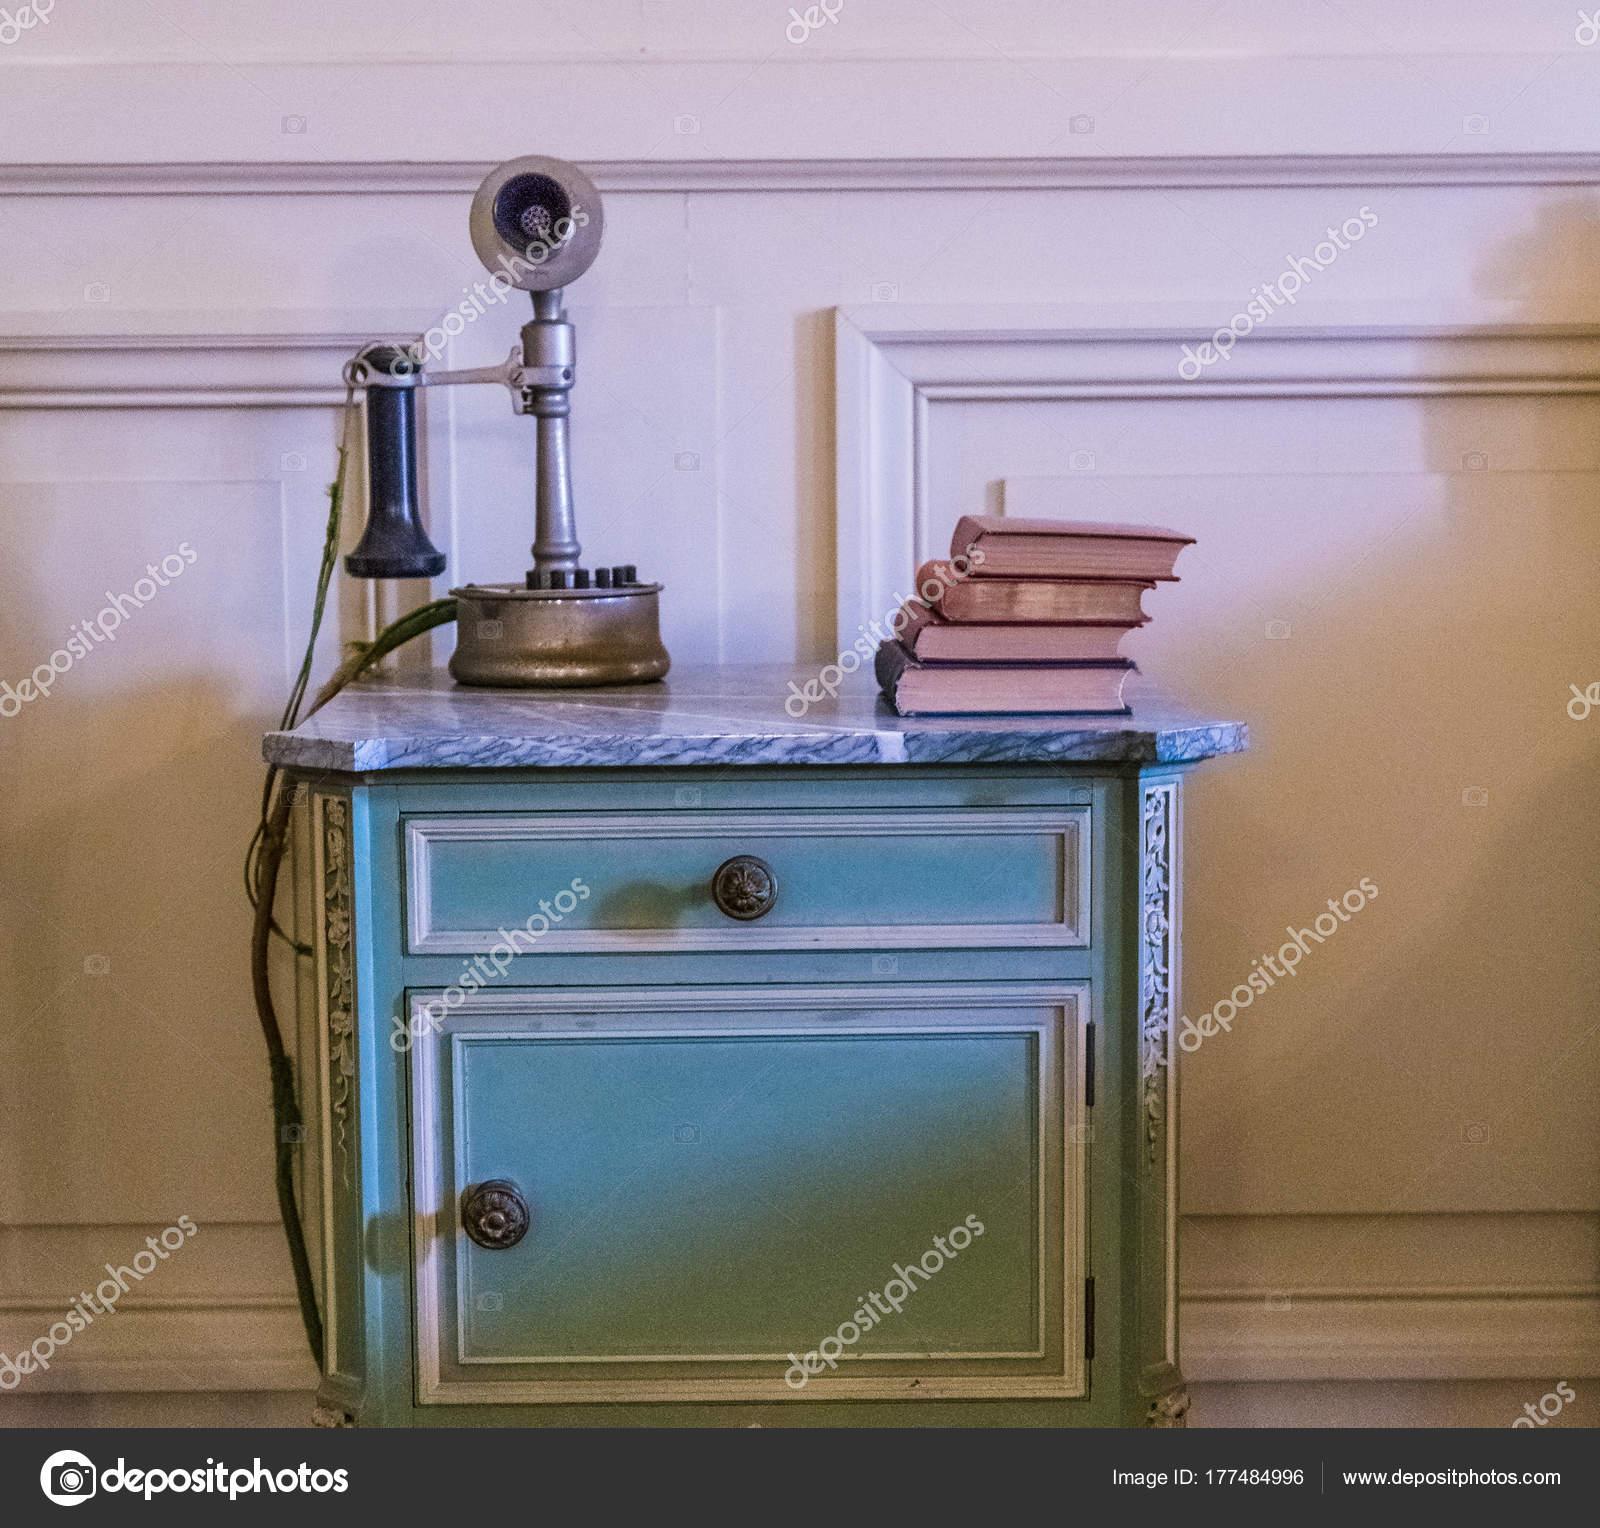 antique kitchen table barn doors 老式床头桌上的古董电话 图库照片 c dbvirago 177484996